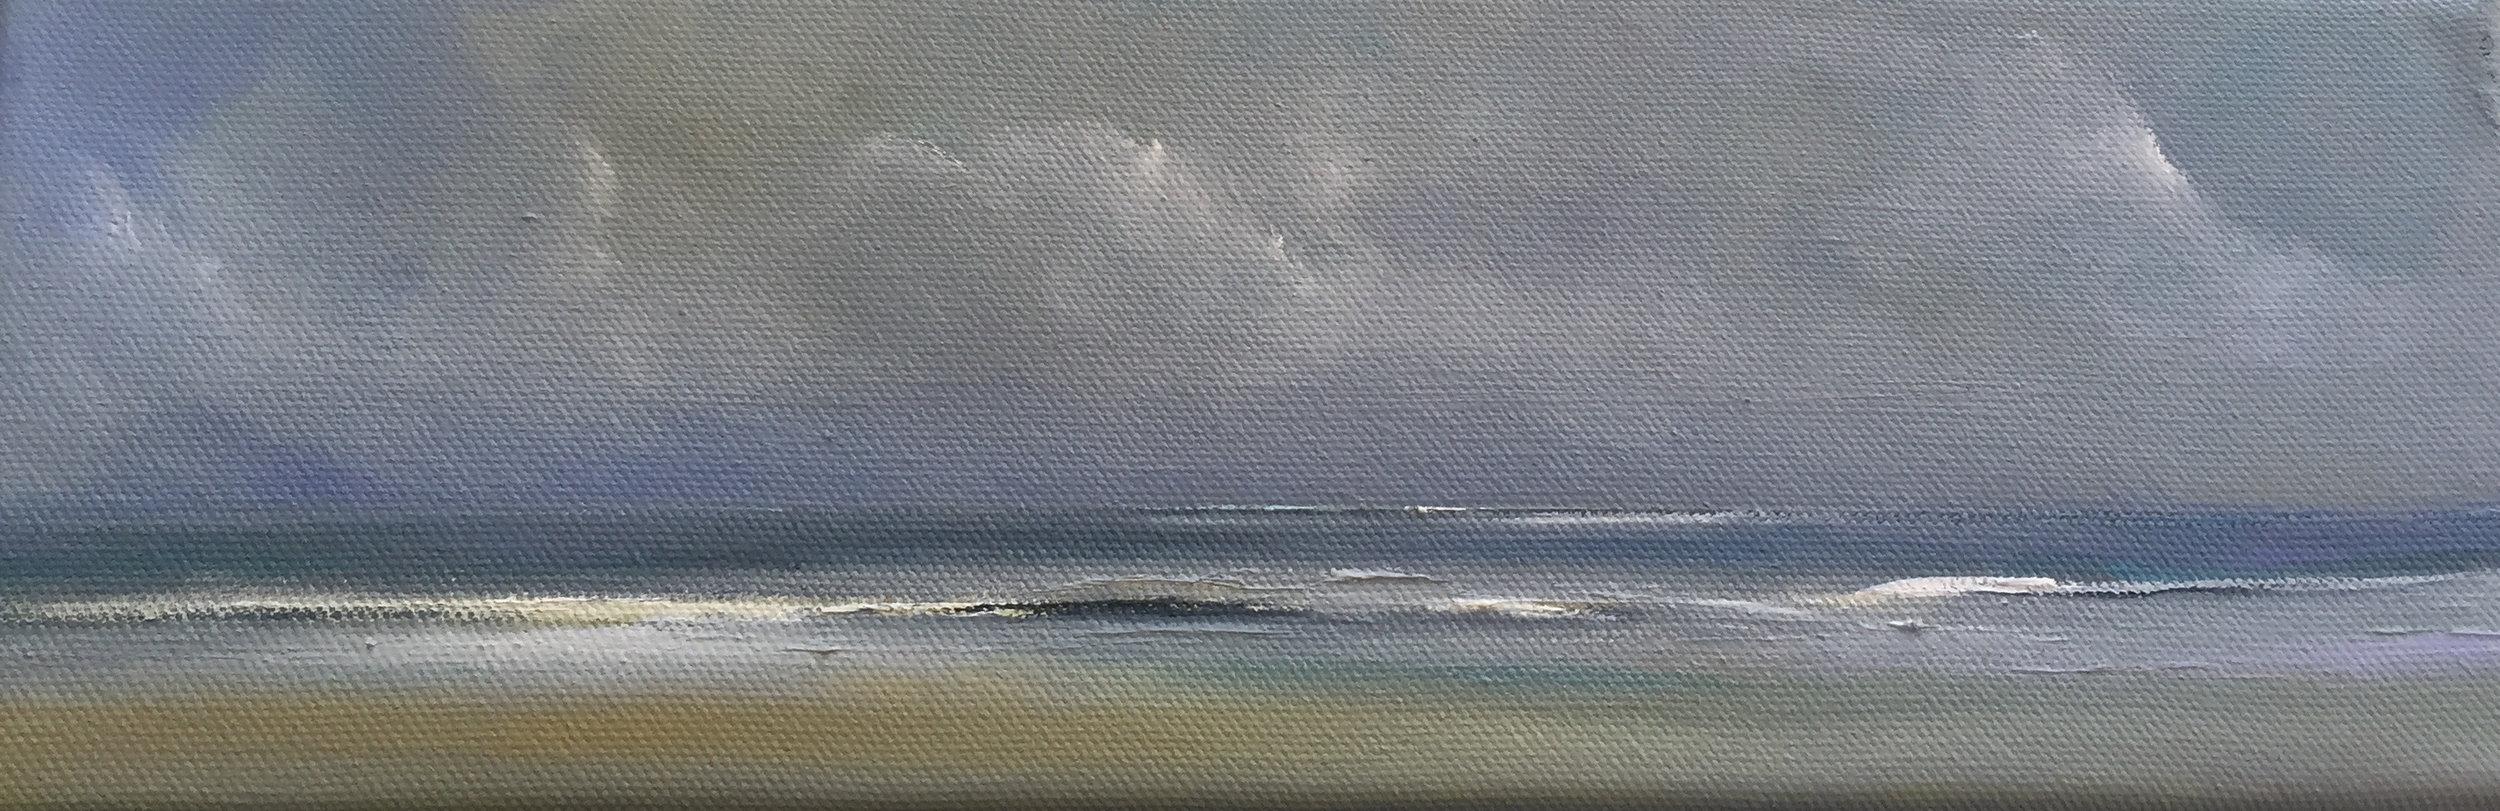 Sand  Polaris Gallery